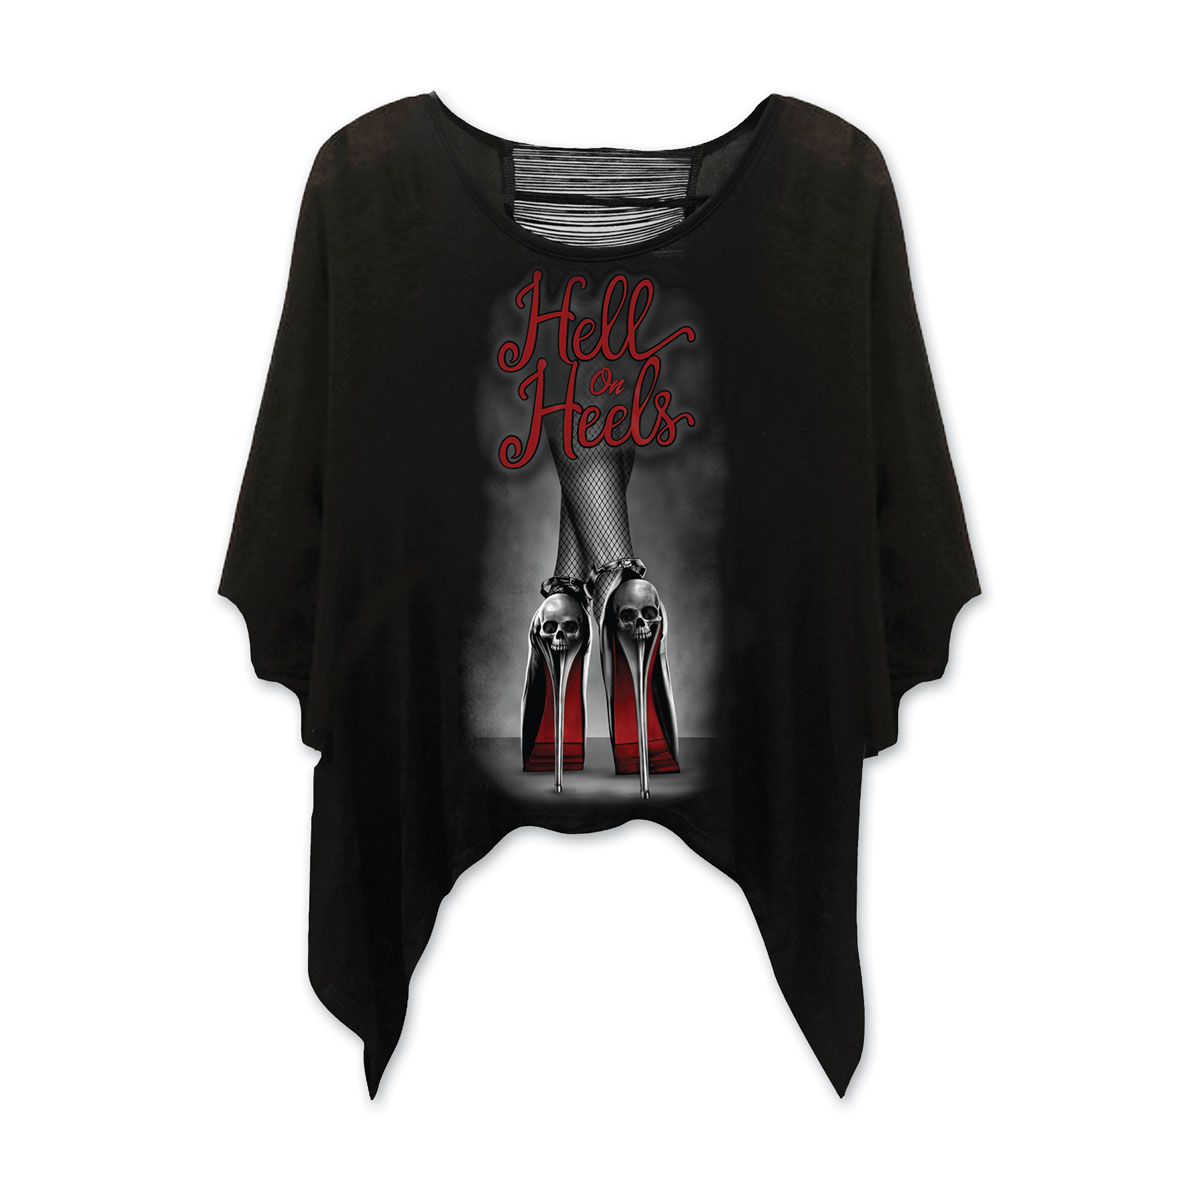 Lethal Angel Women's Hell On Heels Drape Sleeve Black Shirt